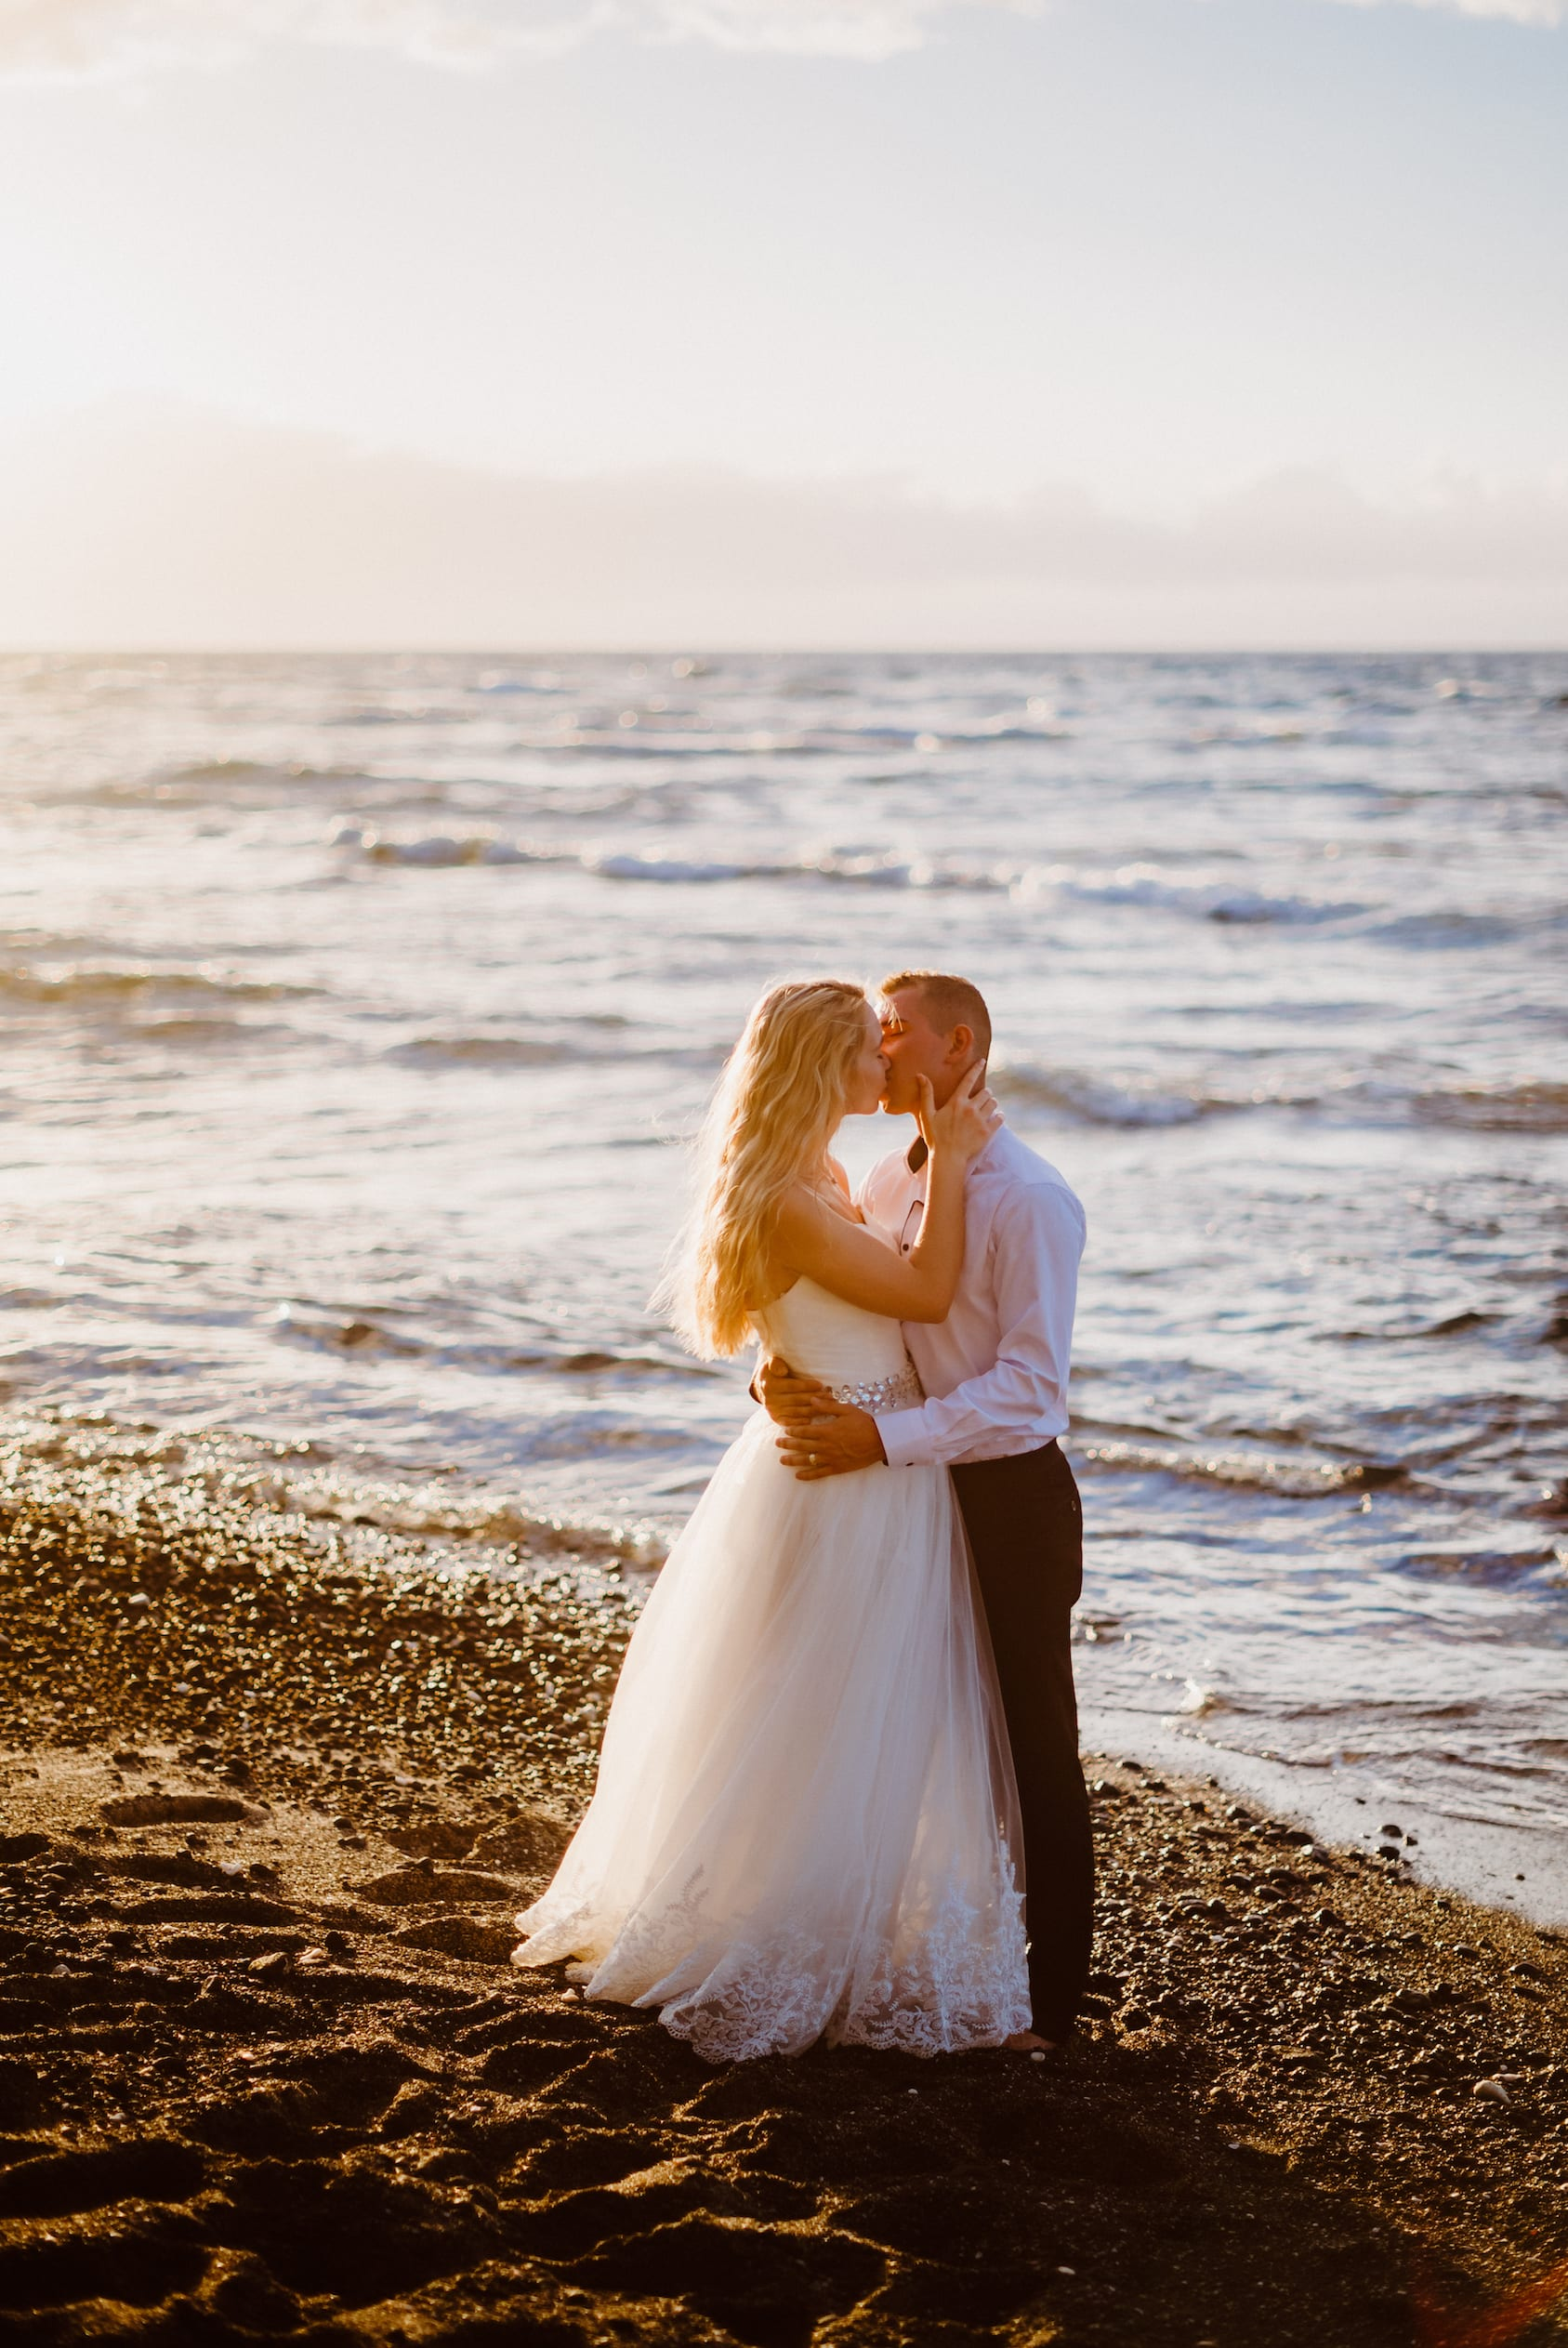 Big-Island-Elopement-Private-Wedding-Hawaii-Beach-09.jpg